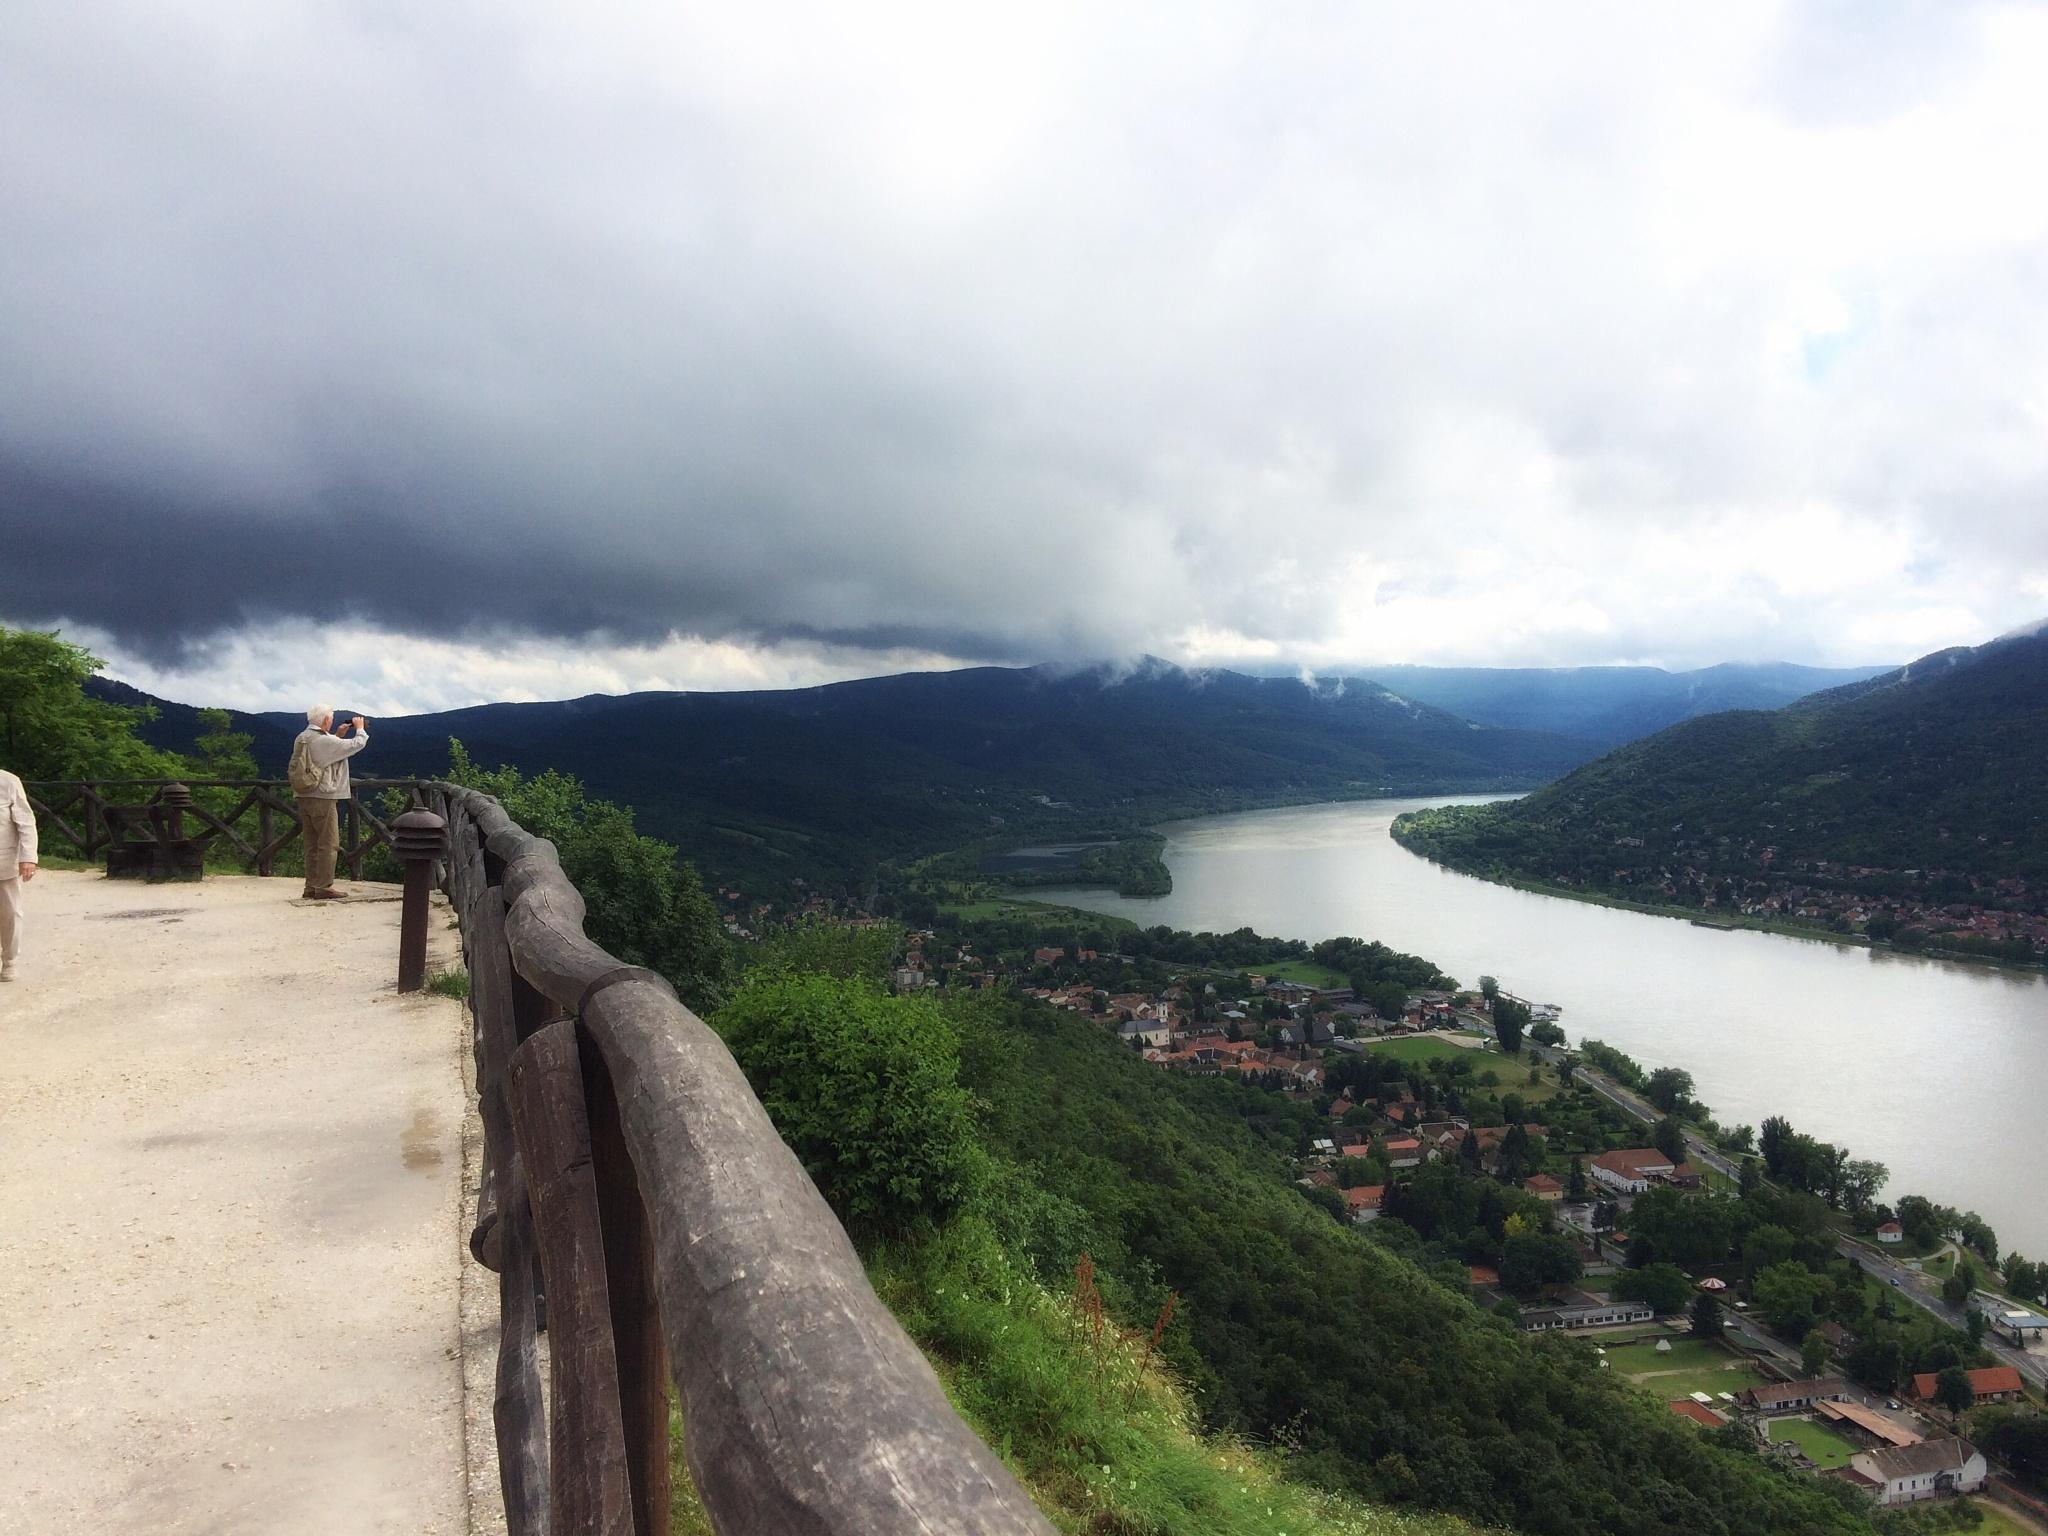 Visegrad Castle - Hungary  by Korinna J.